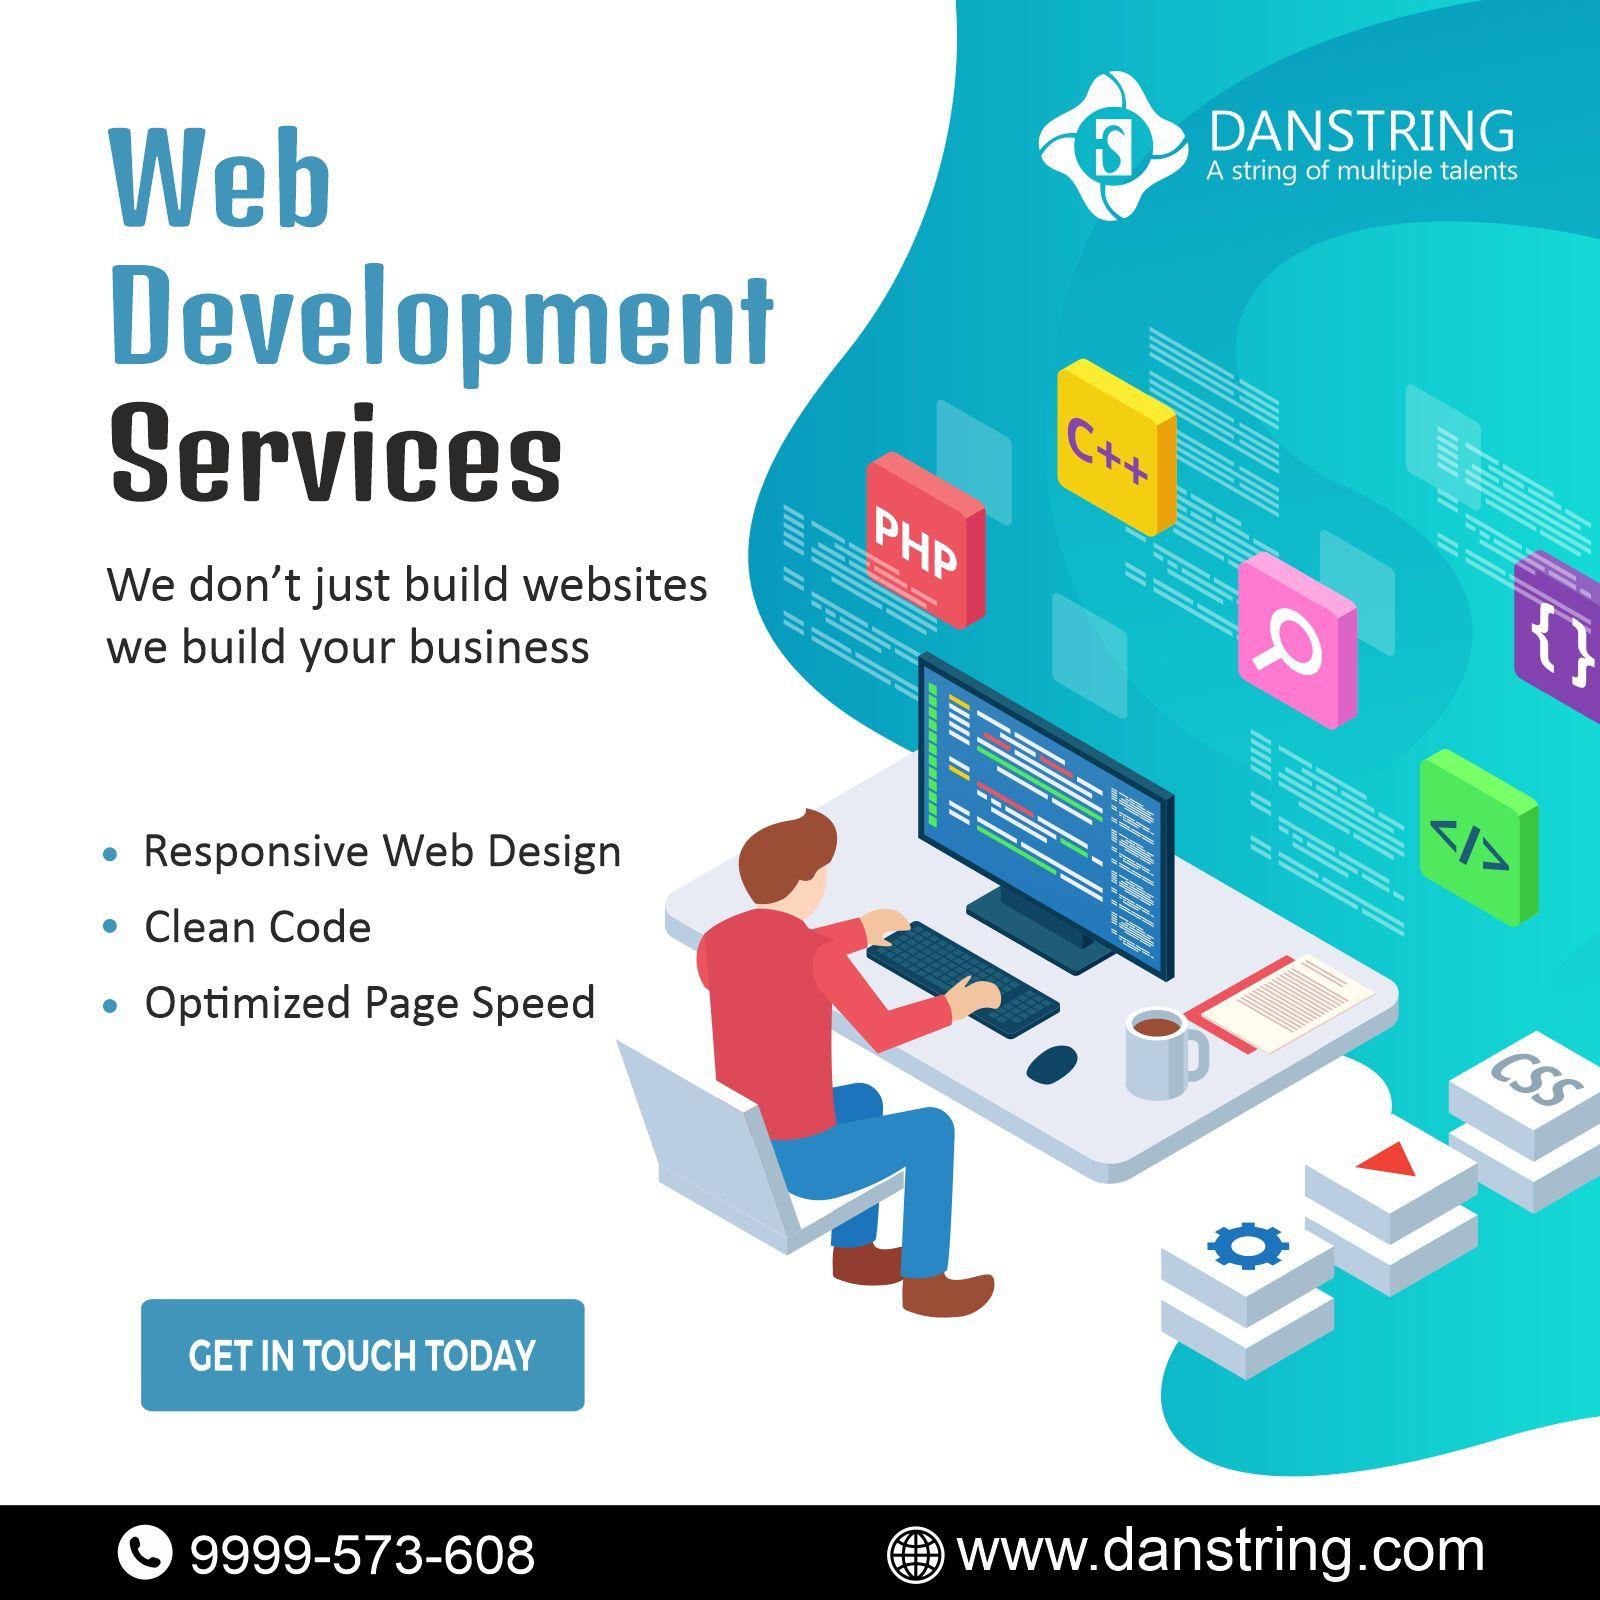 Web Development Services Web Development Agency Digital Marketing Digital Marketing Agency